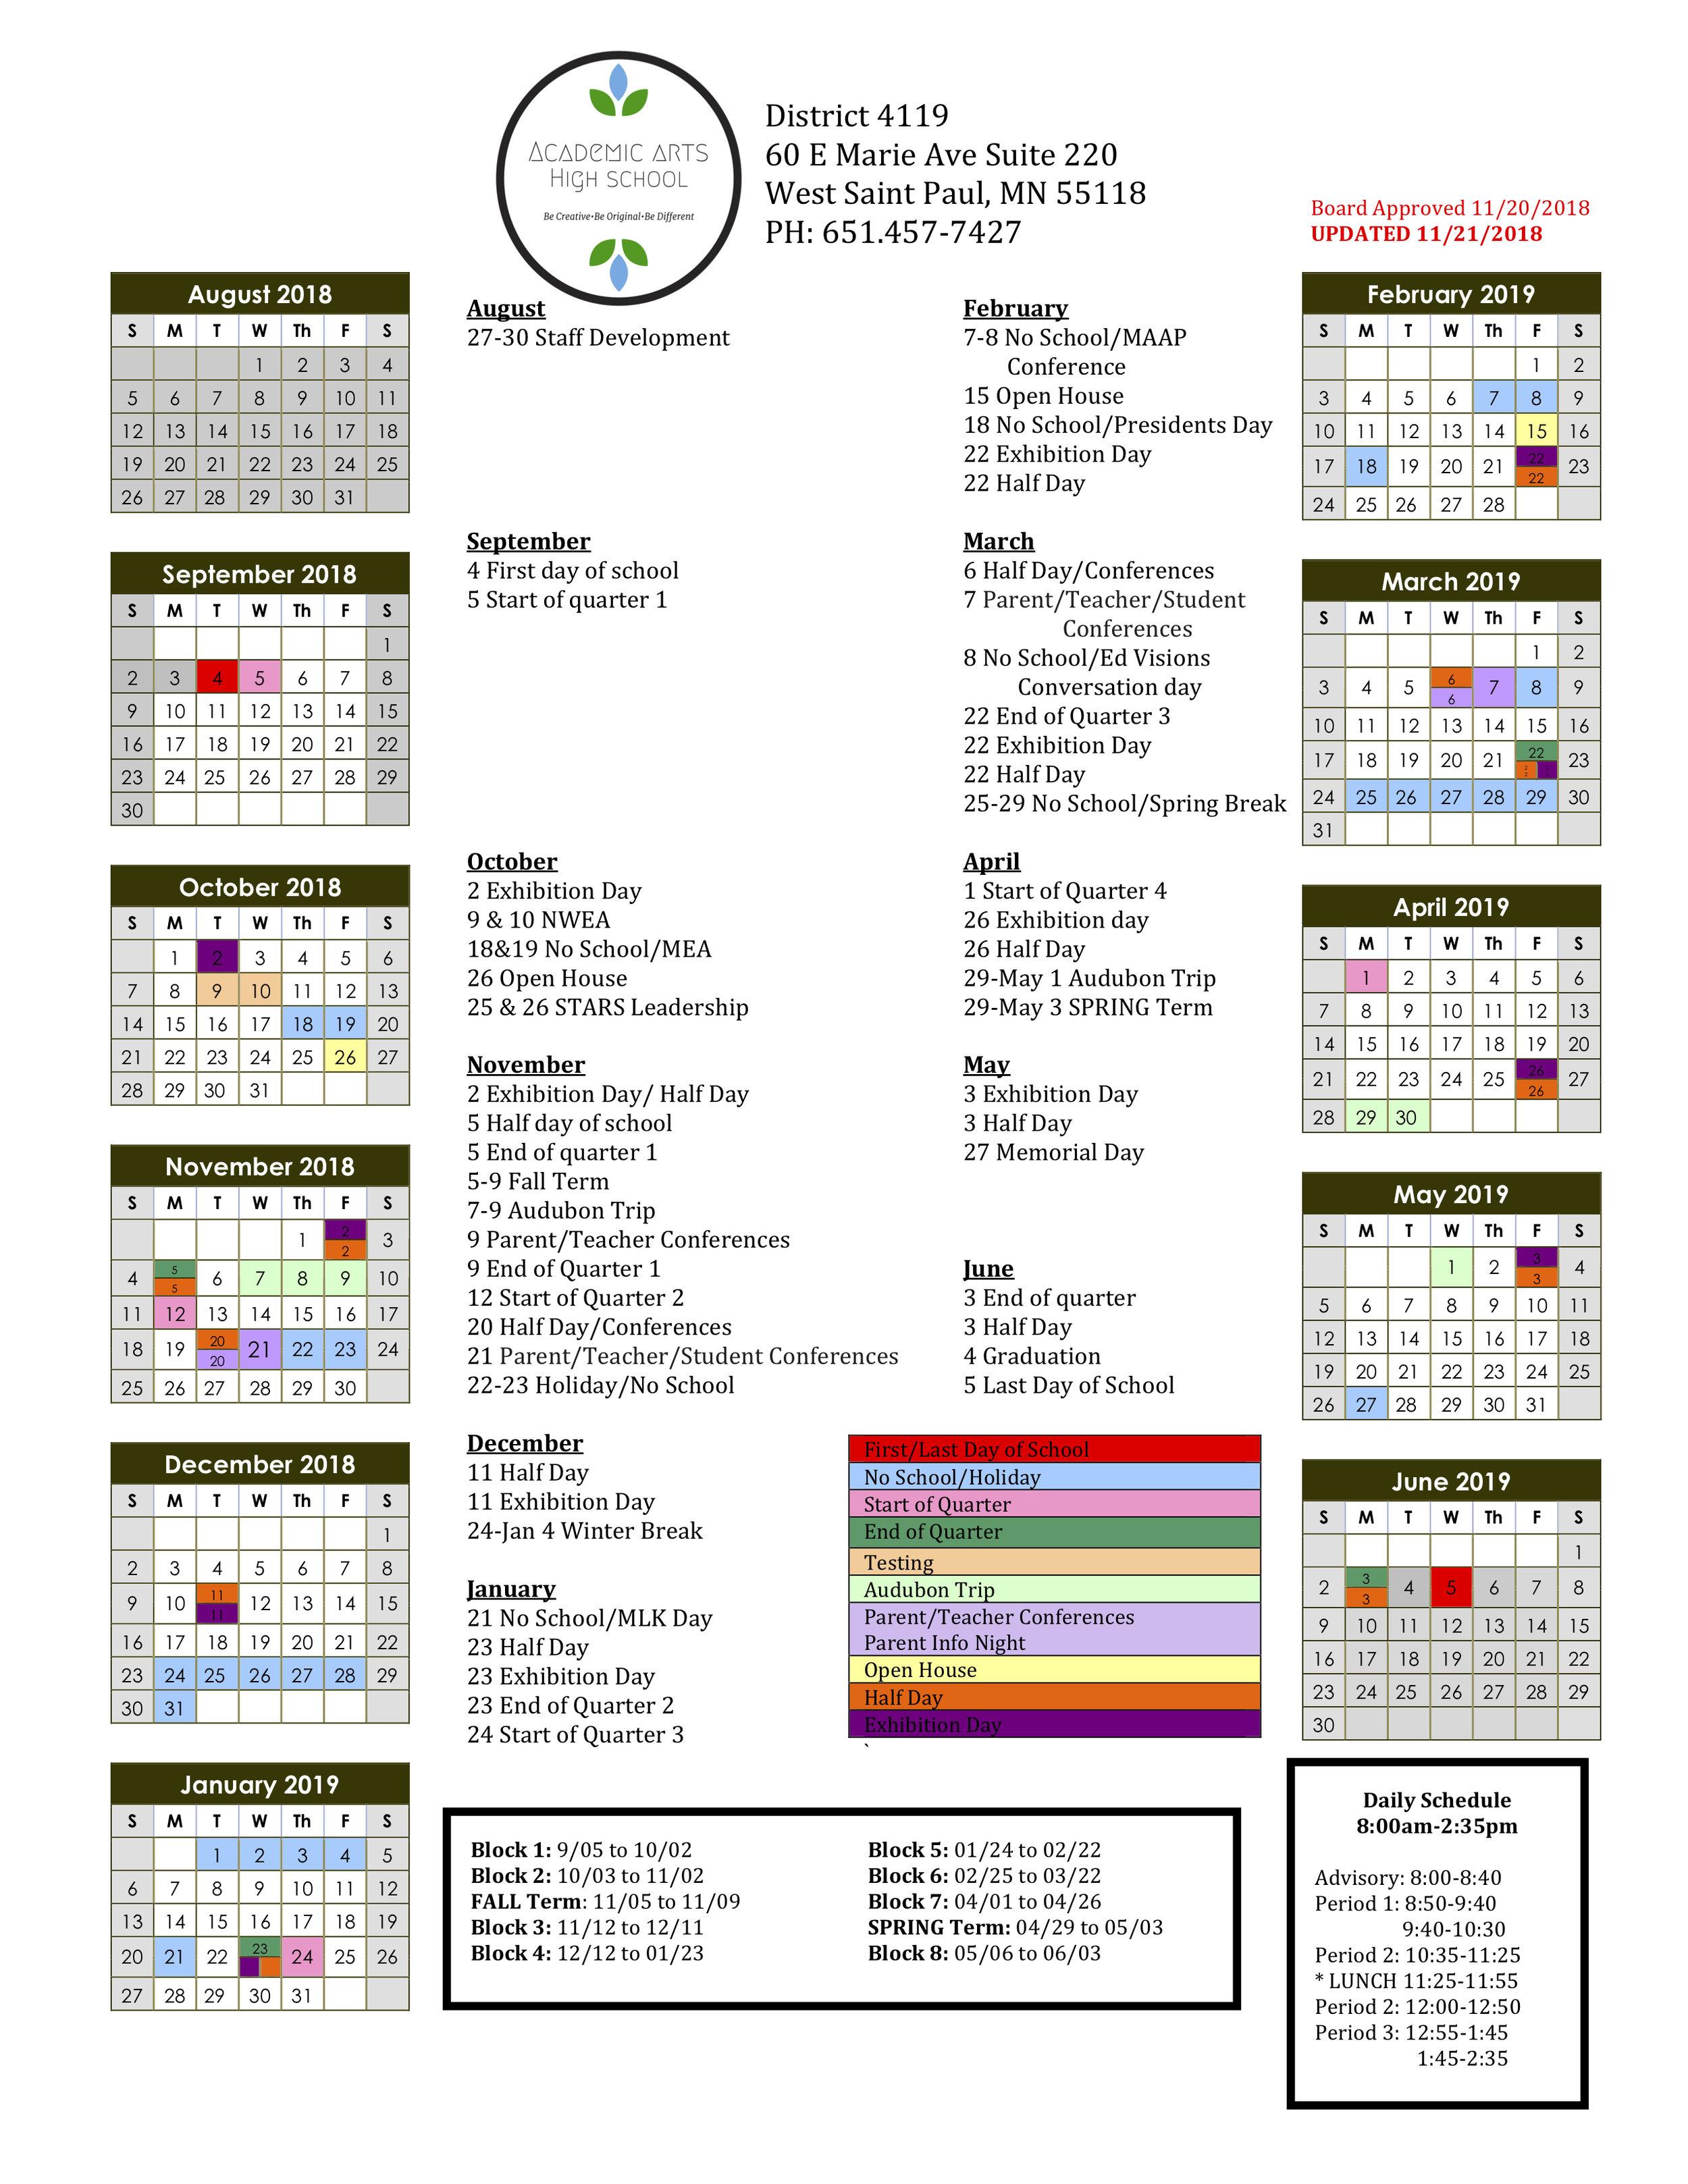 11-20 Board Approved.calendar.jpg